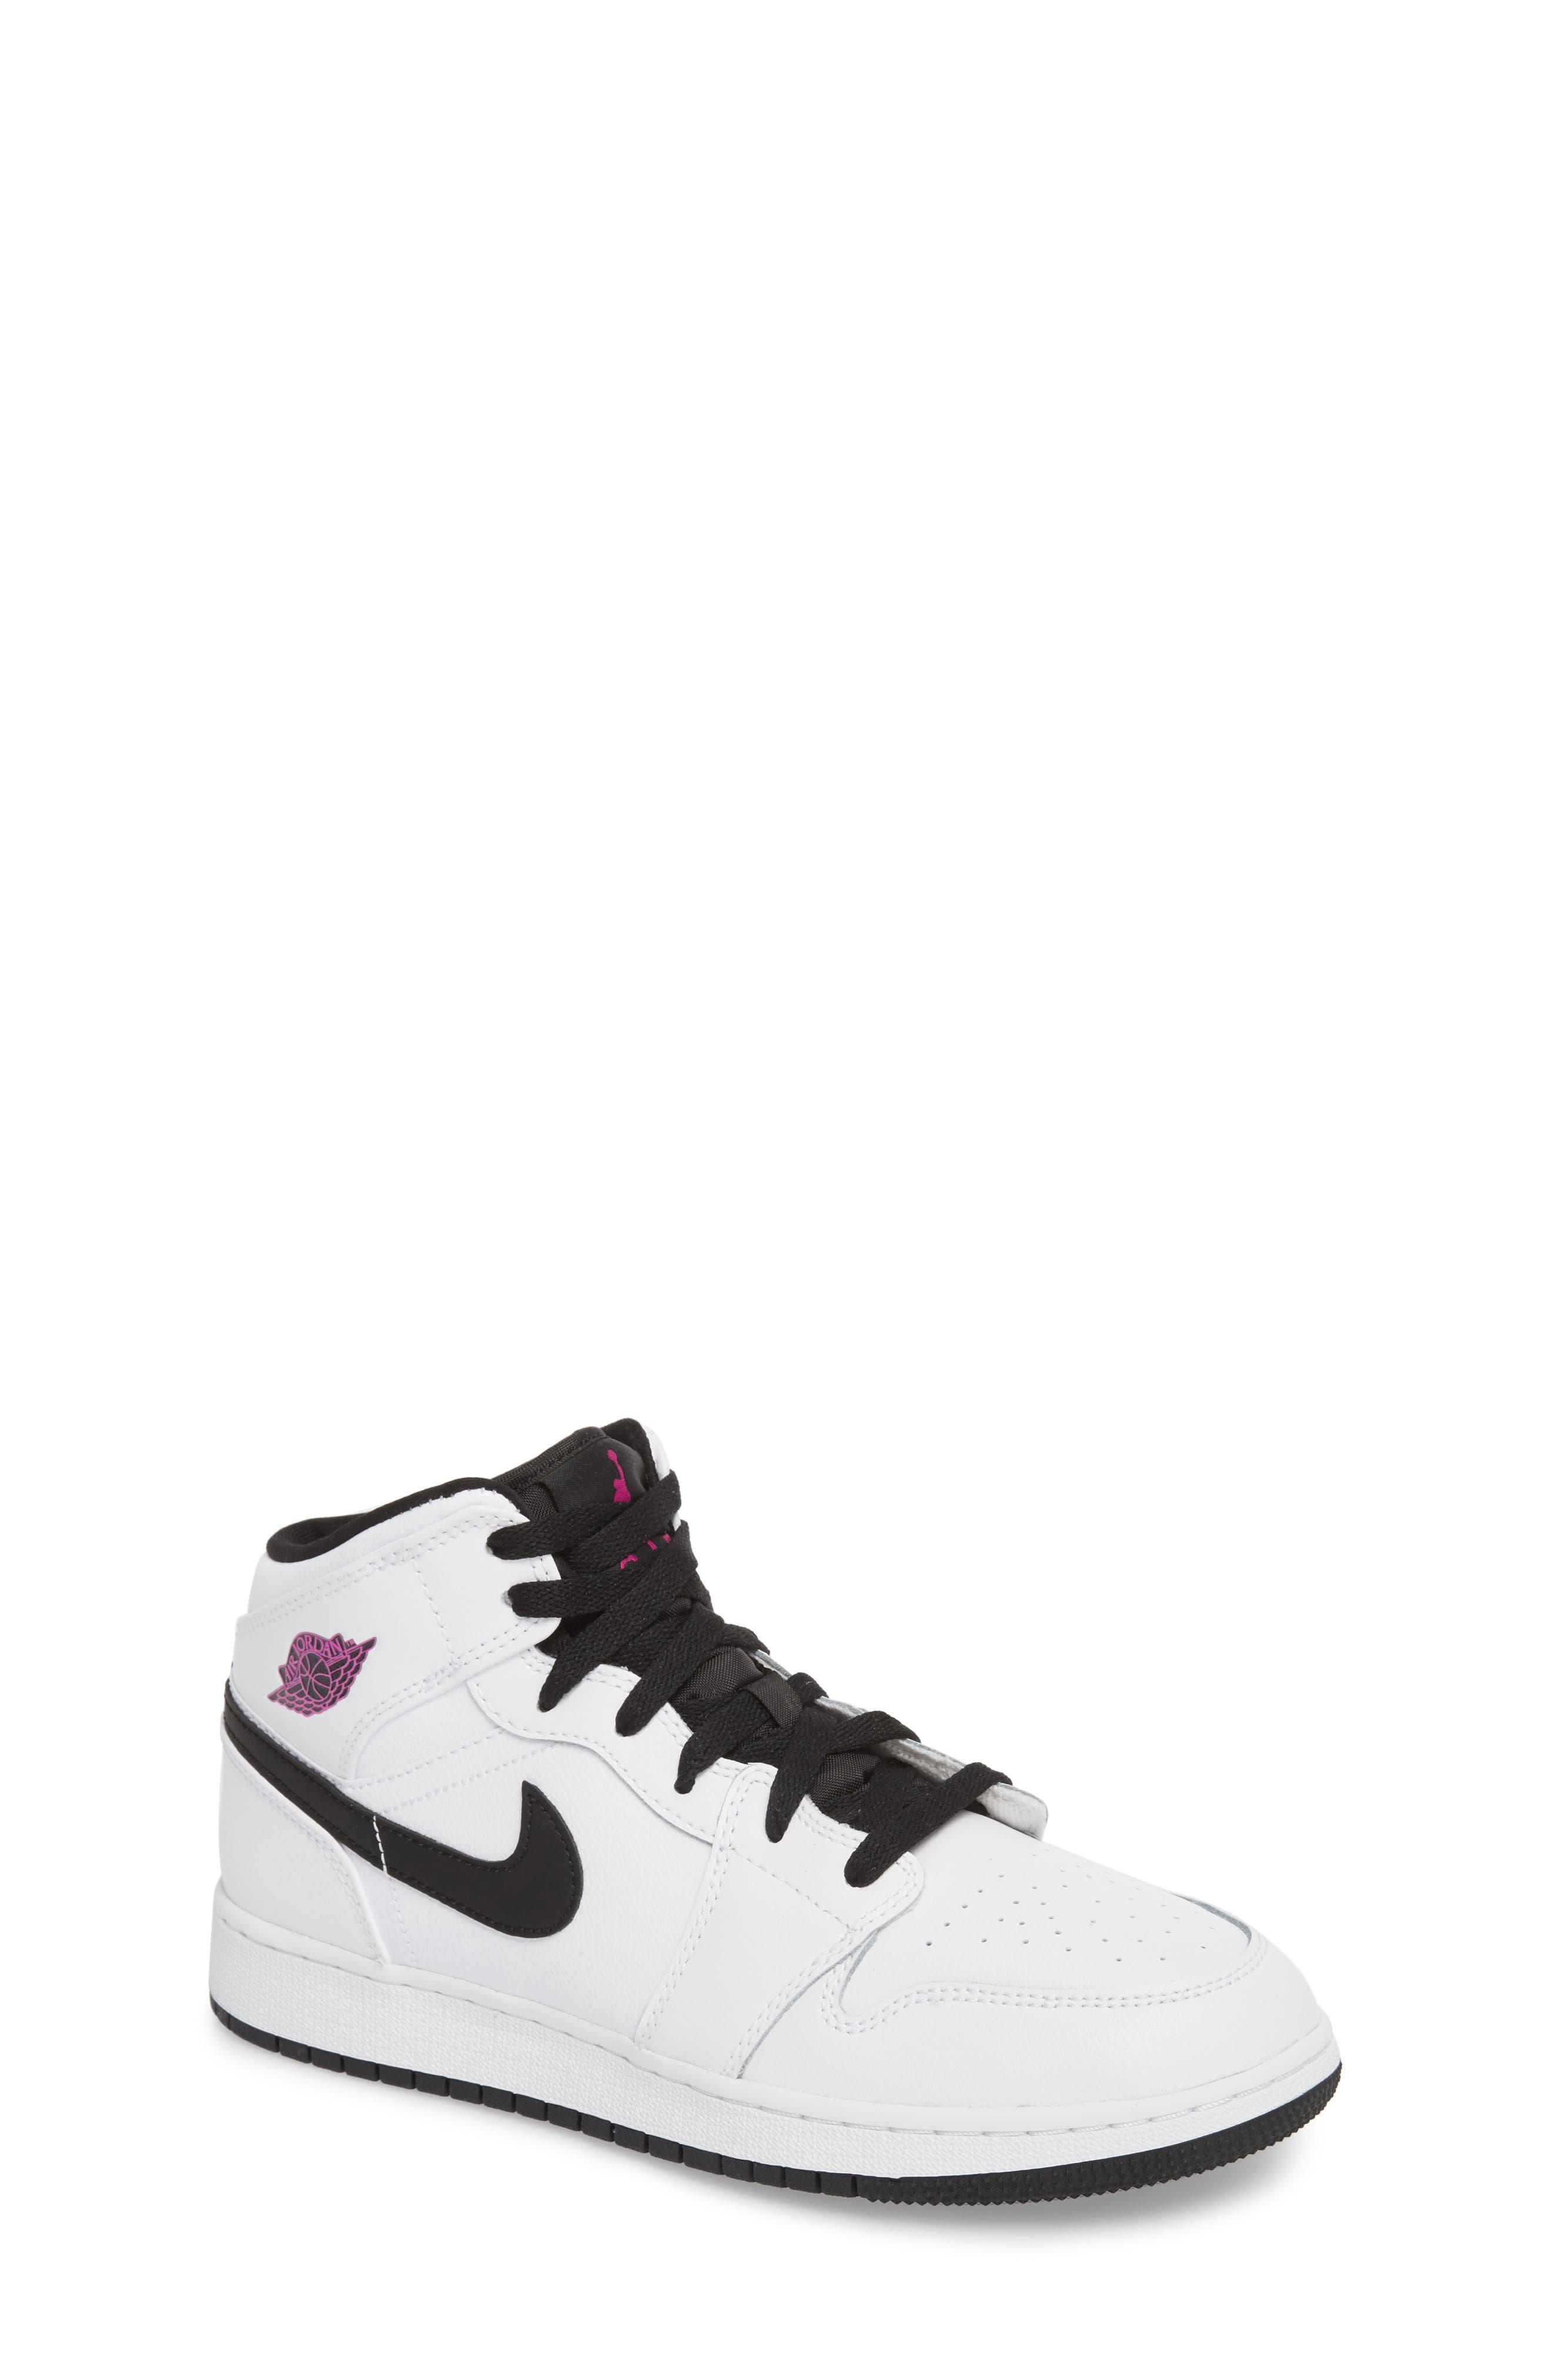 Nike 'Air Jordan 1 Mid' Sneaker,                             Main thumbnail 1, color,                             White/ Fuchsia Blast/ Black